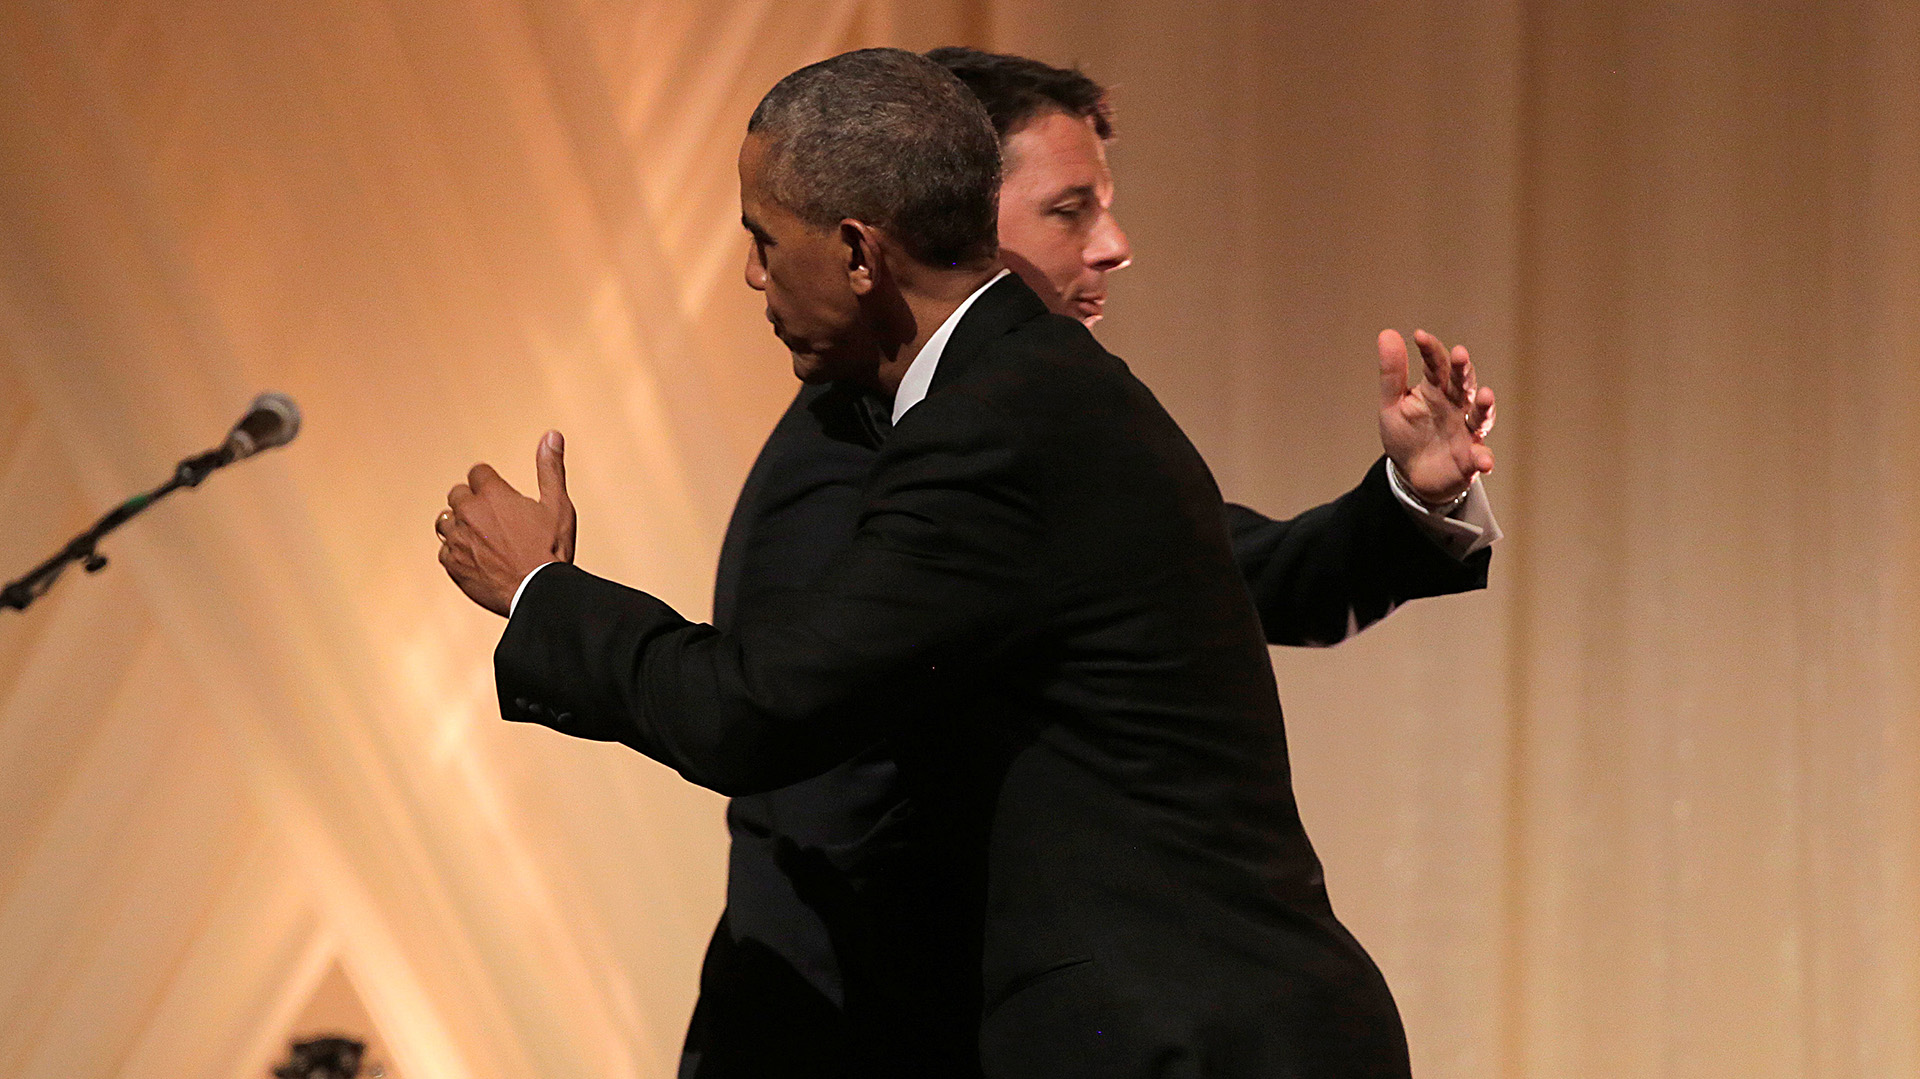 El presidente Barack Obama dio un cálido abrazo el primer ministro italiano